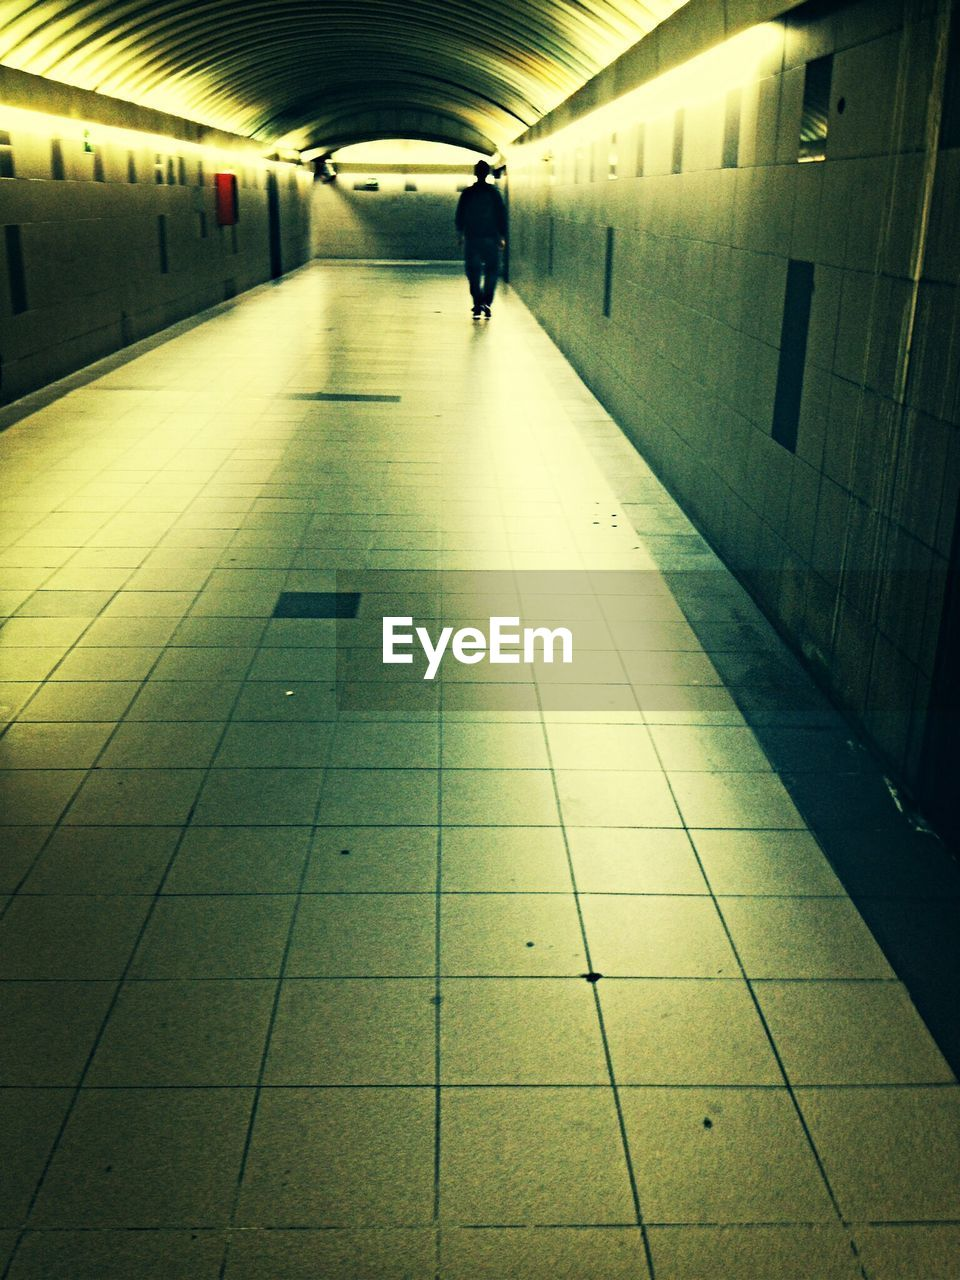 Rear view of person walking in corridor